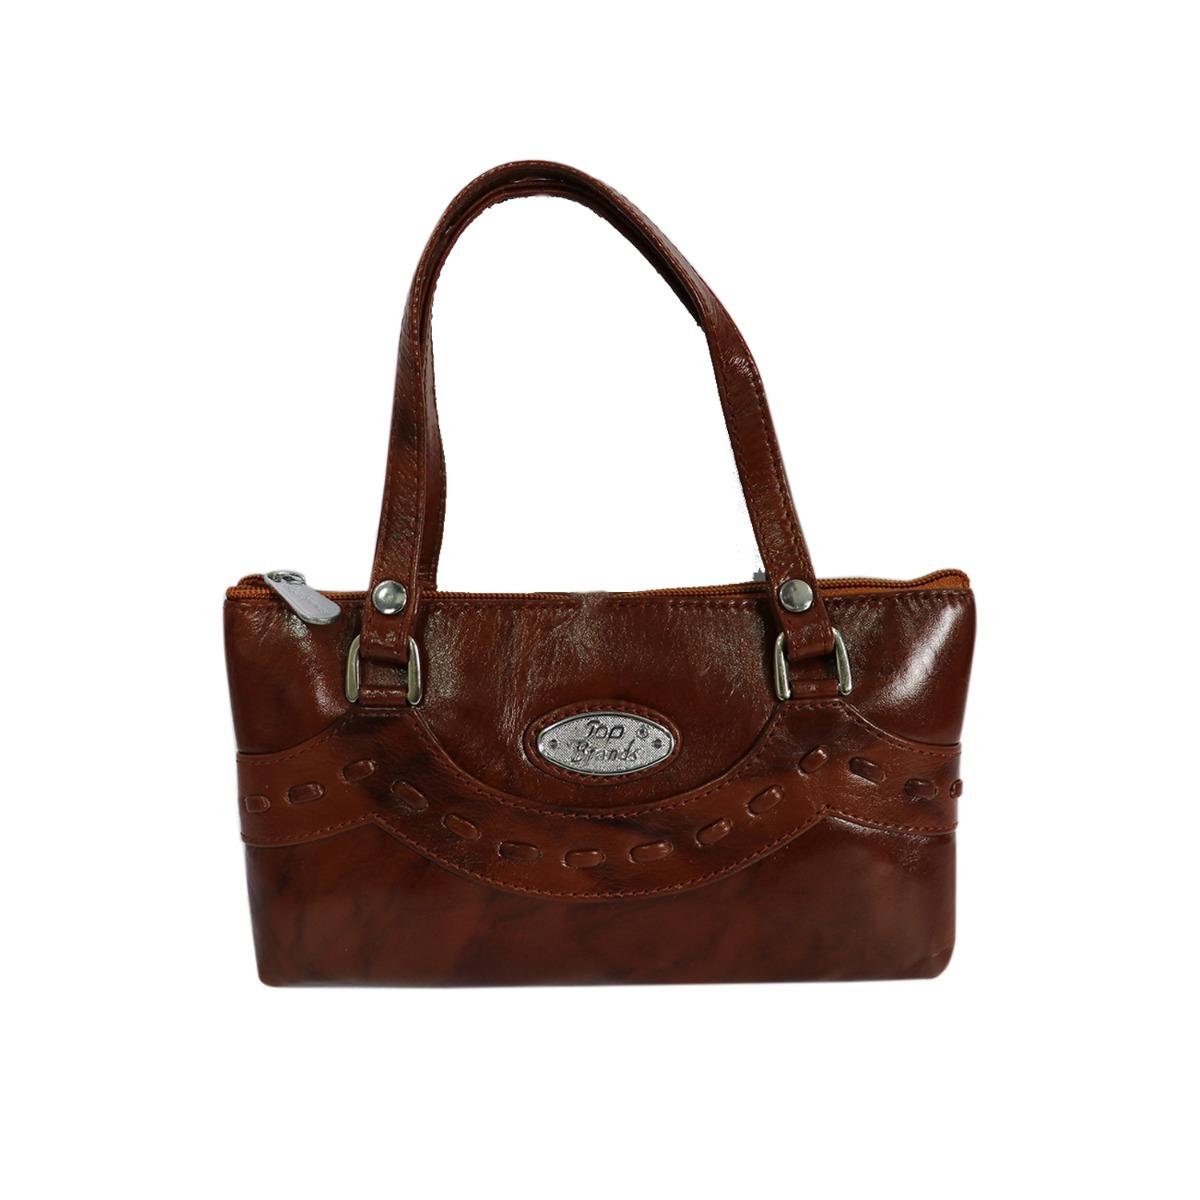 Classy handbag for women